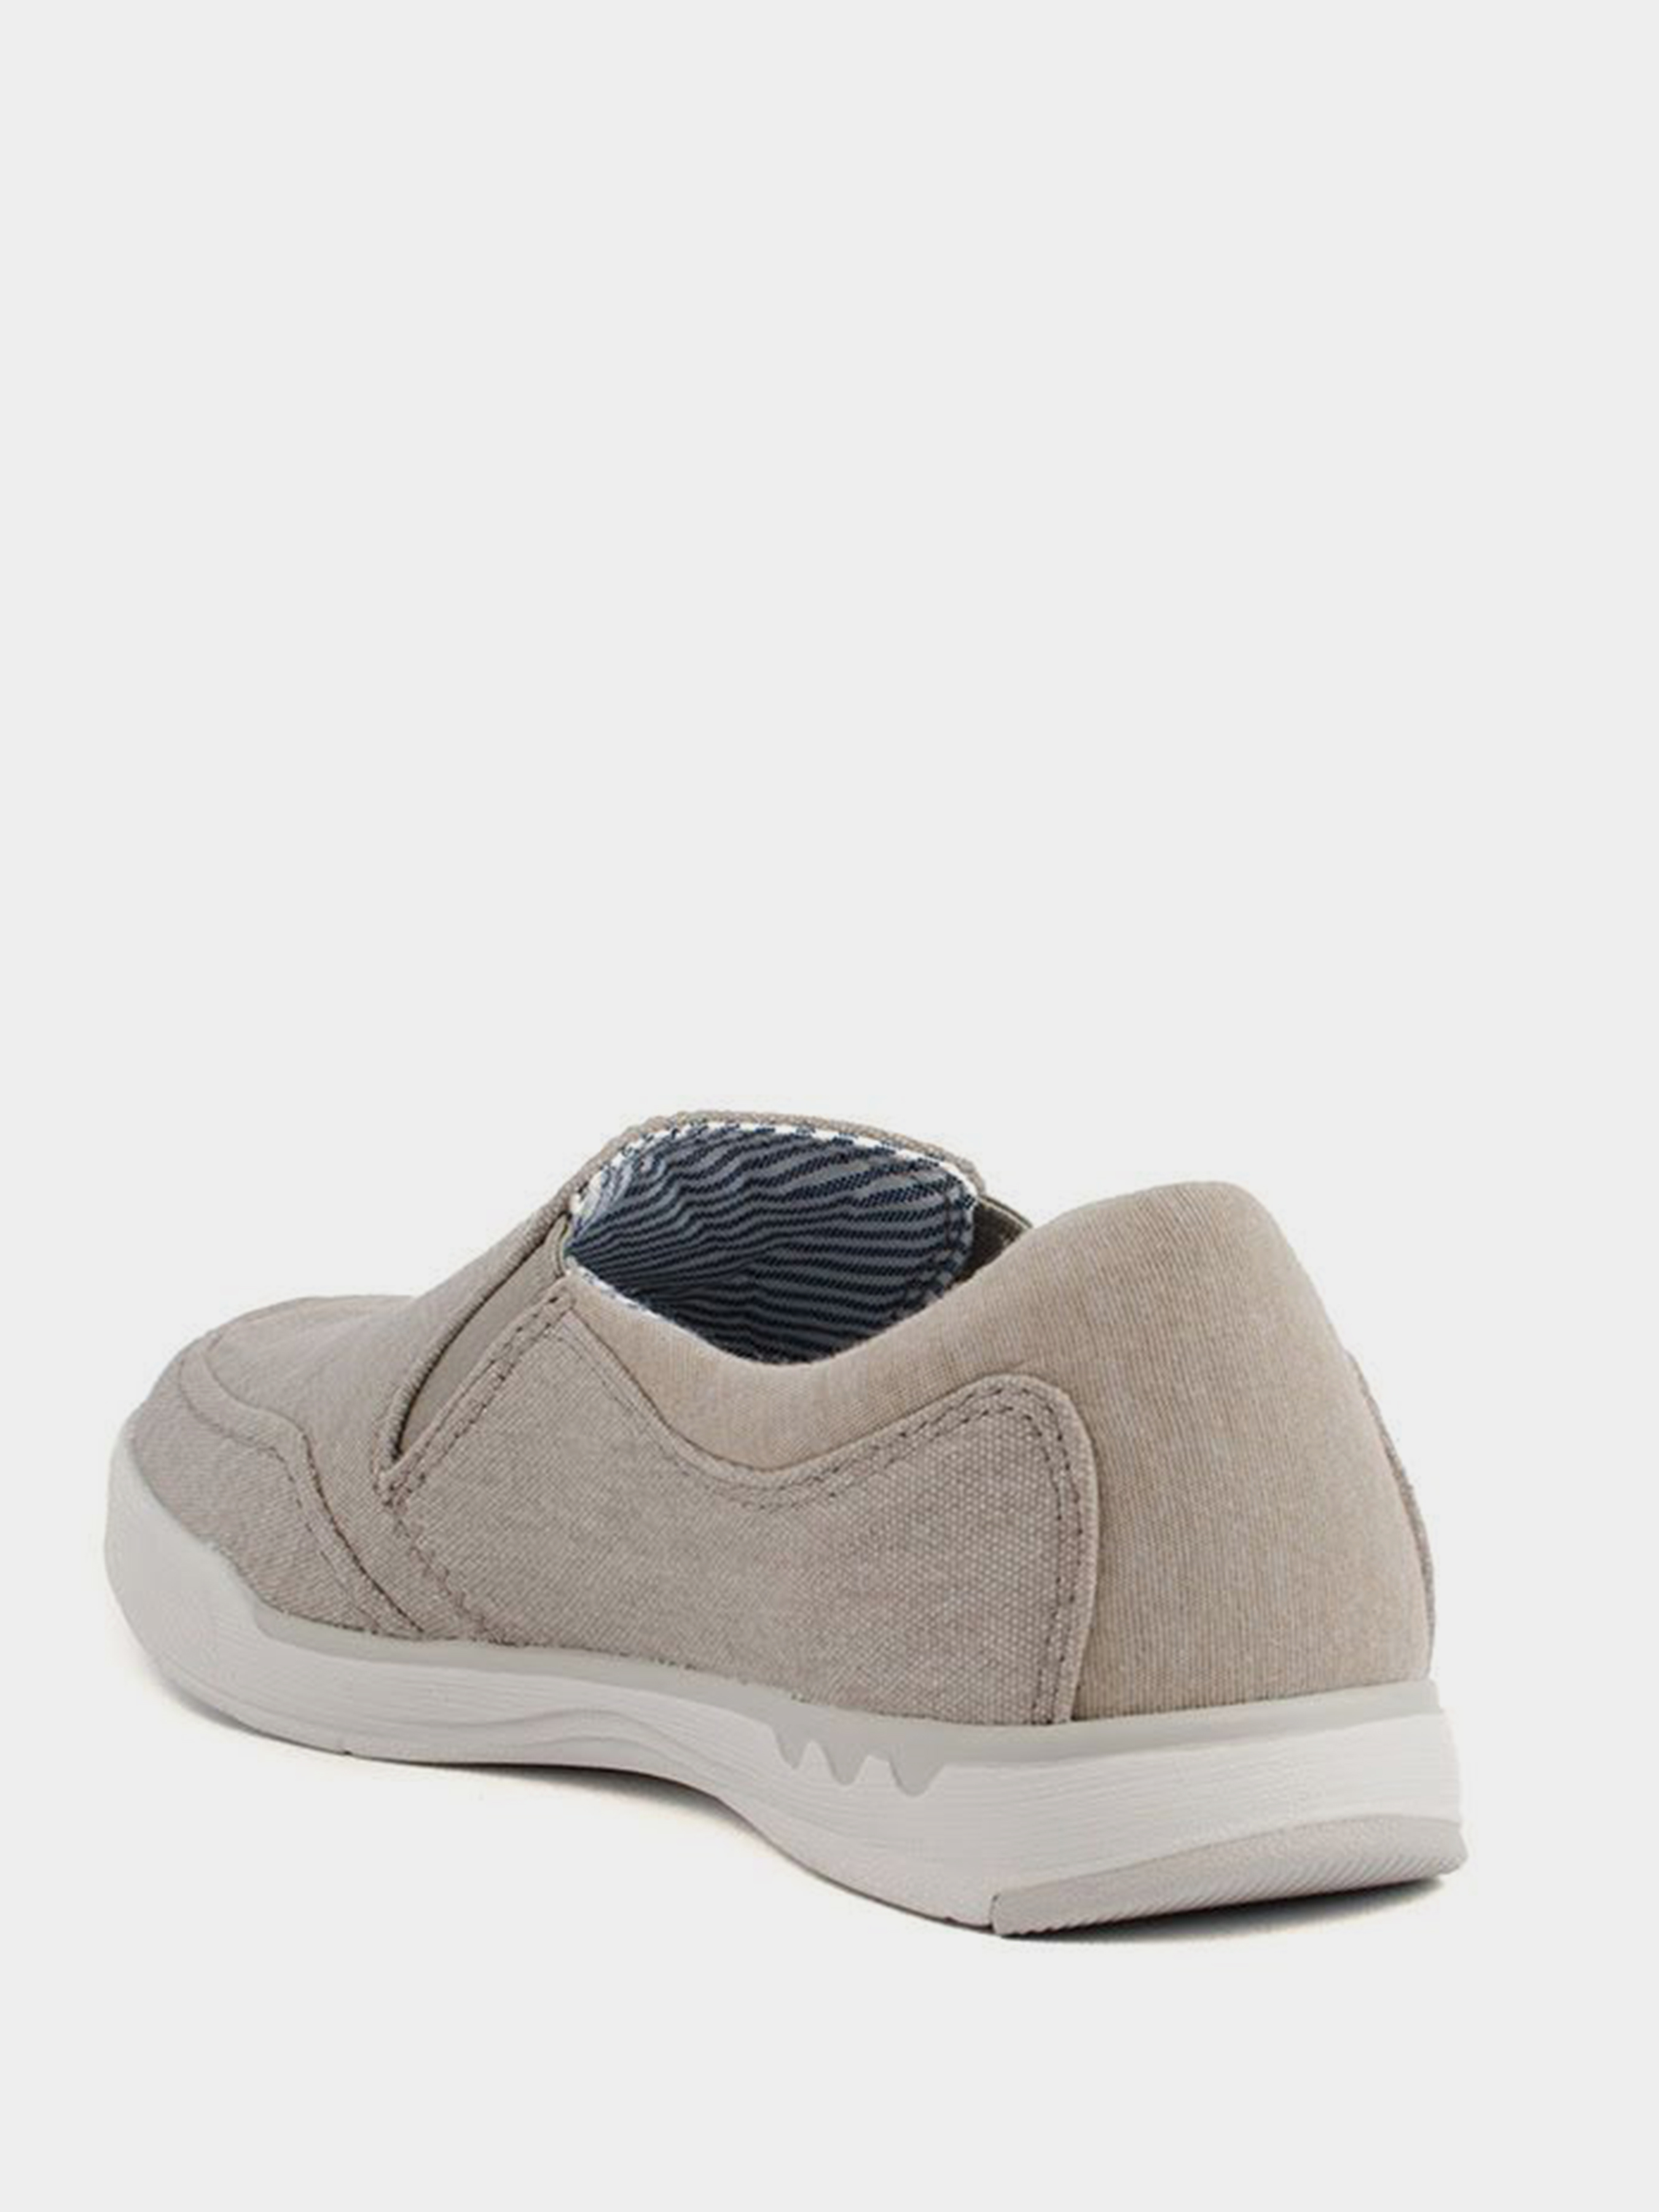 Cлипоны для мужчин Clarks Step Isle Slip OM2856 размеры обуви, 2017